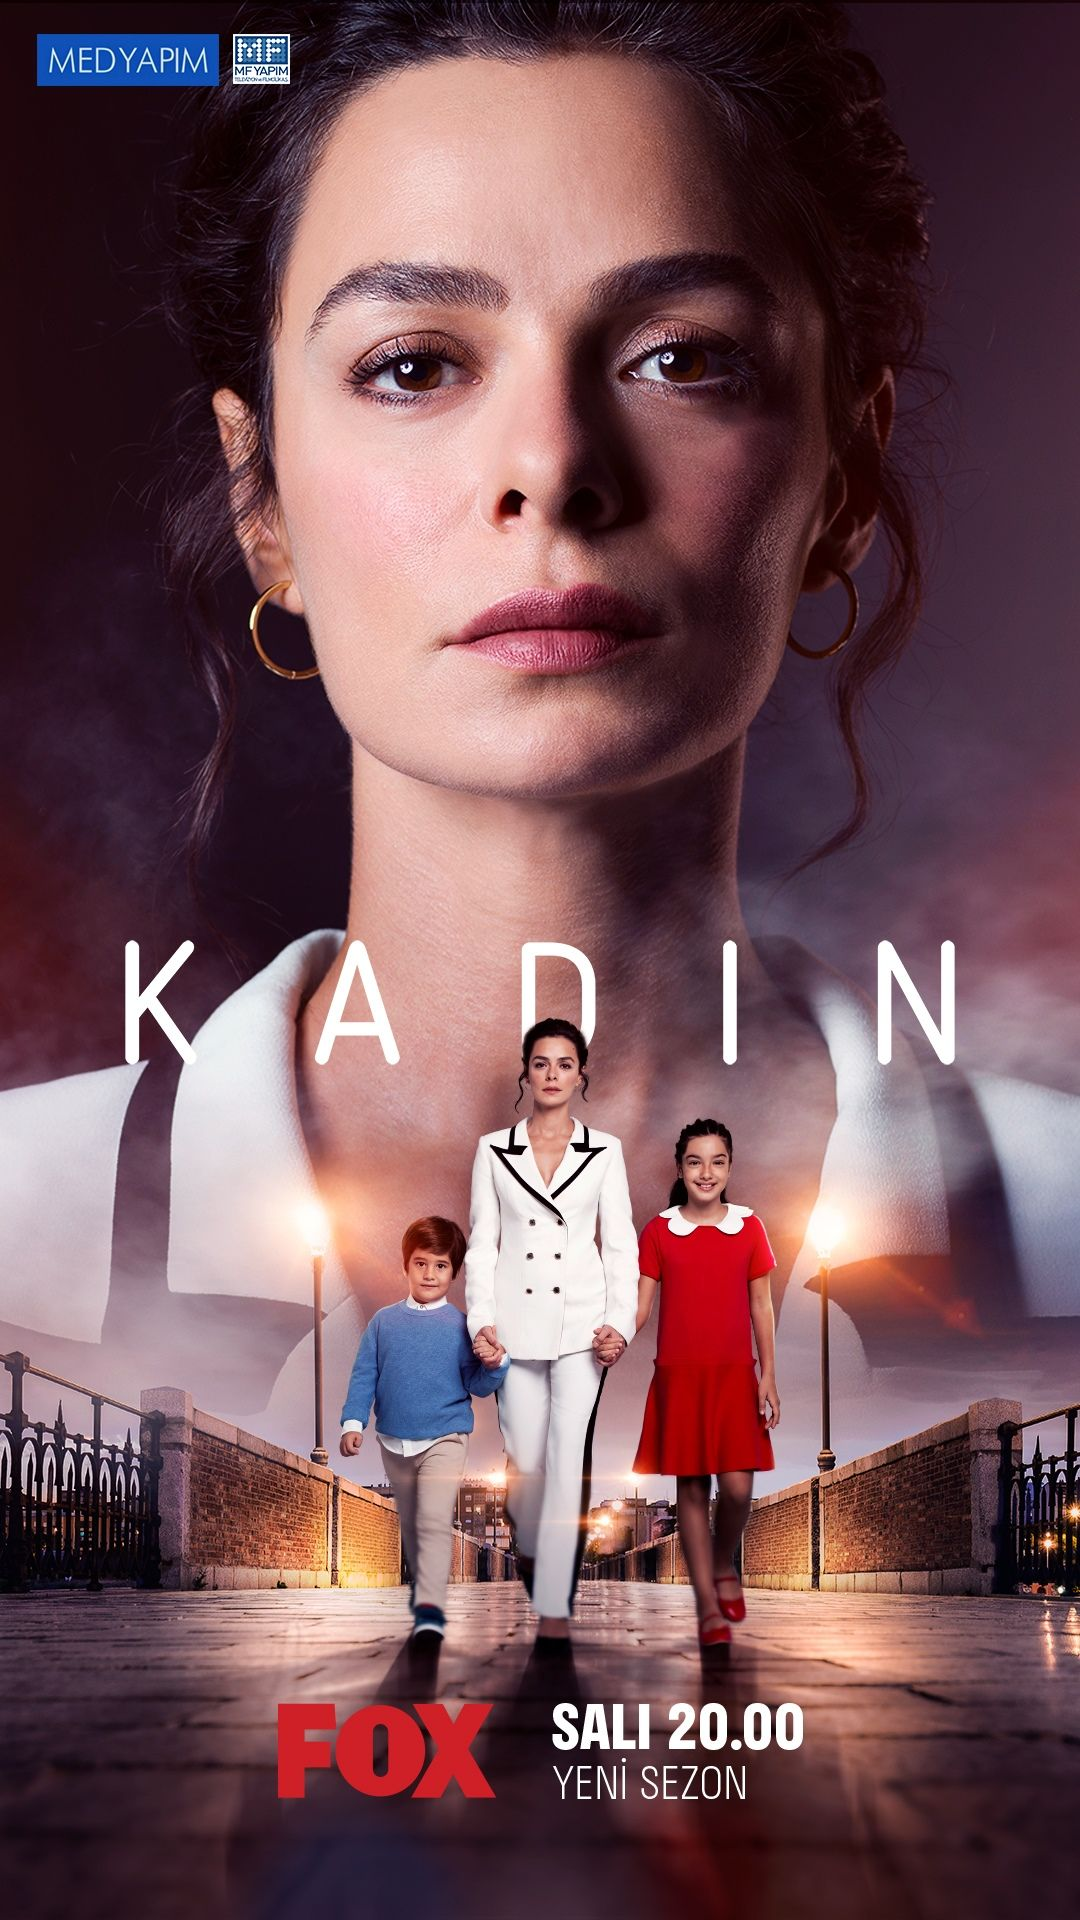 Kadin 72 Bolum Izle 19 Kasim 2019 Series Y Novelas Series Completas En Espanol Ver Series Online Gratis